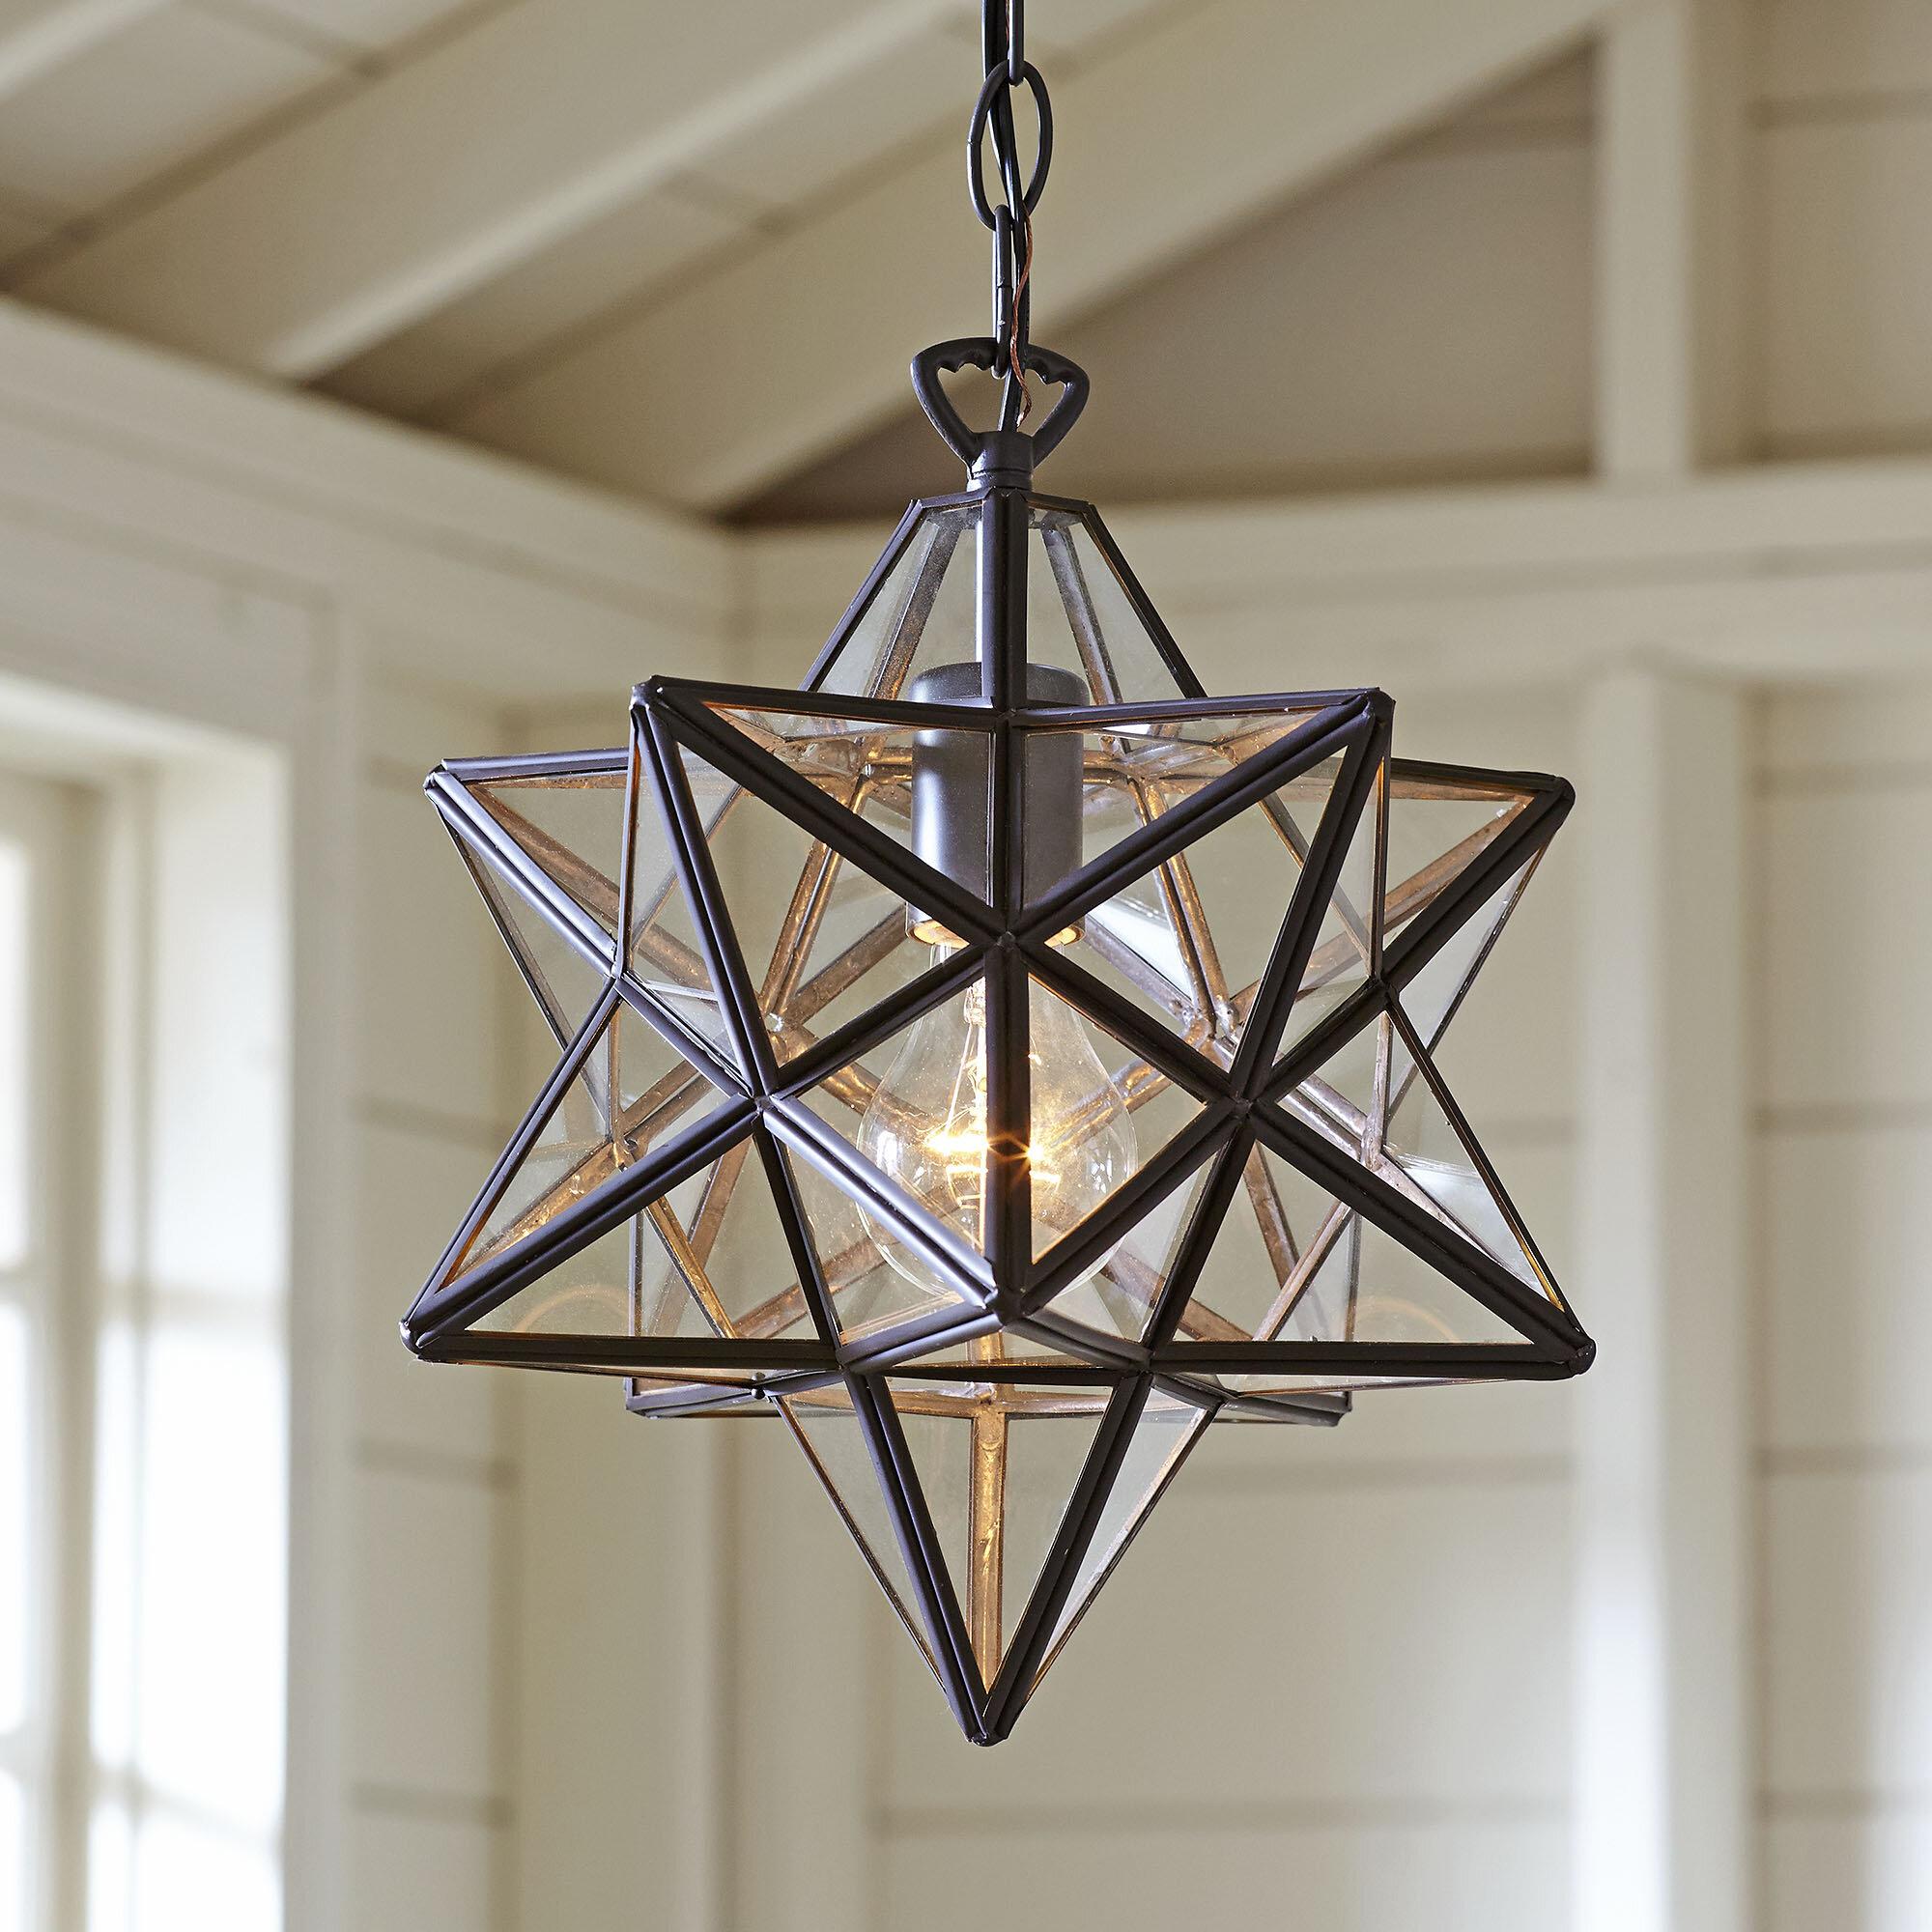 Sture 1 light geometric pendant